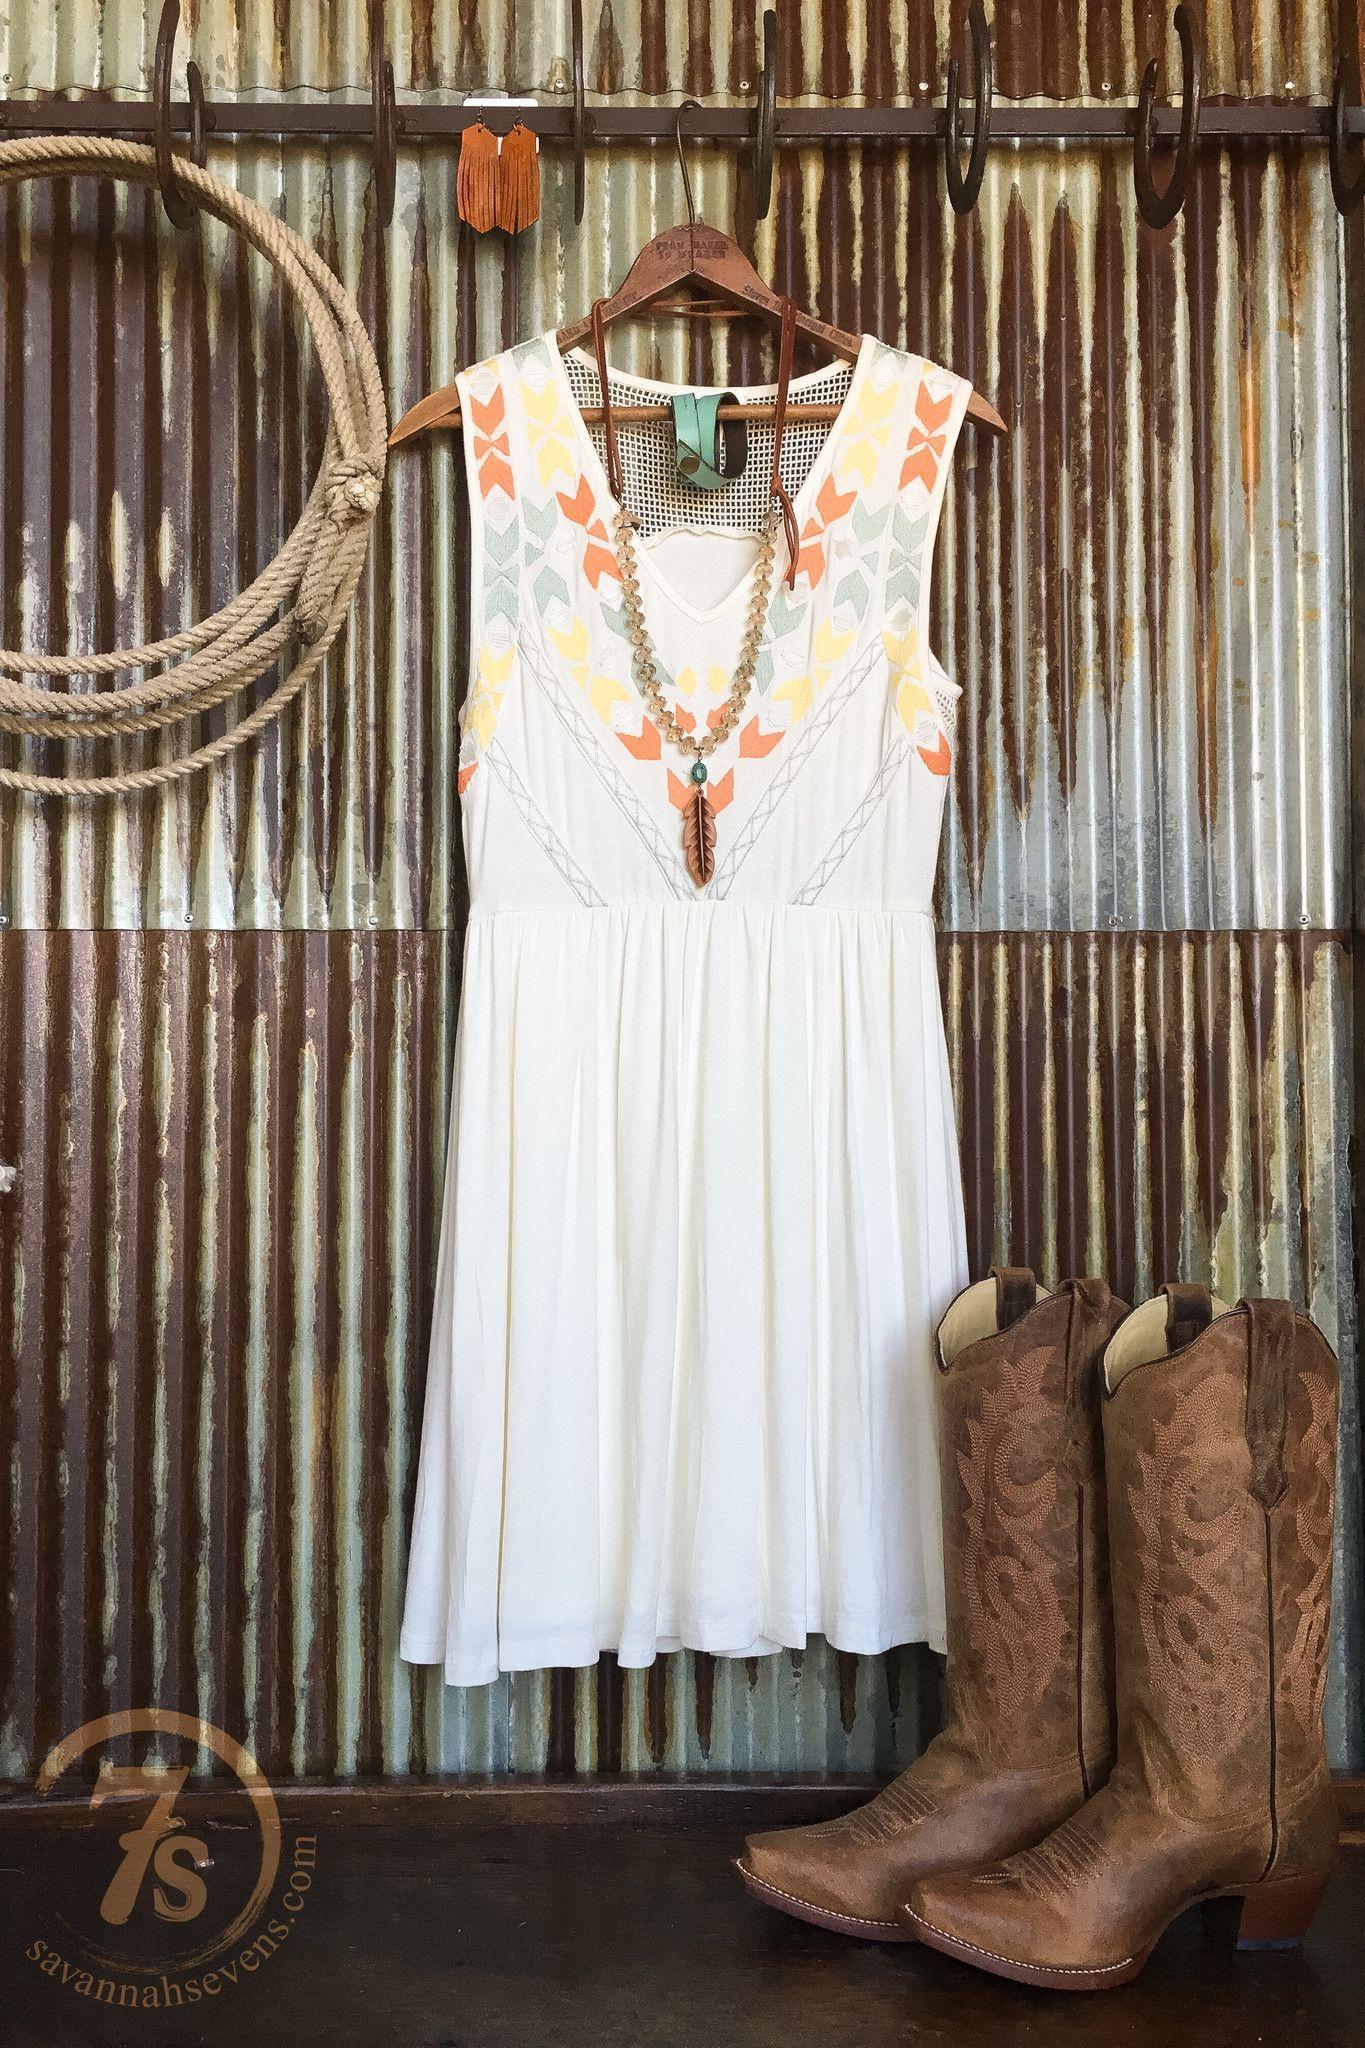 The westfall savannah s fashion pinterest country girl